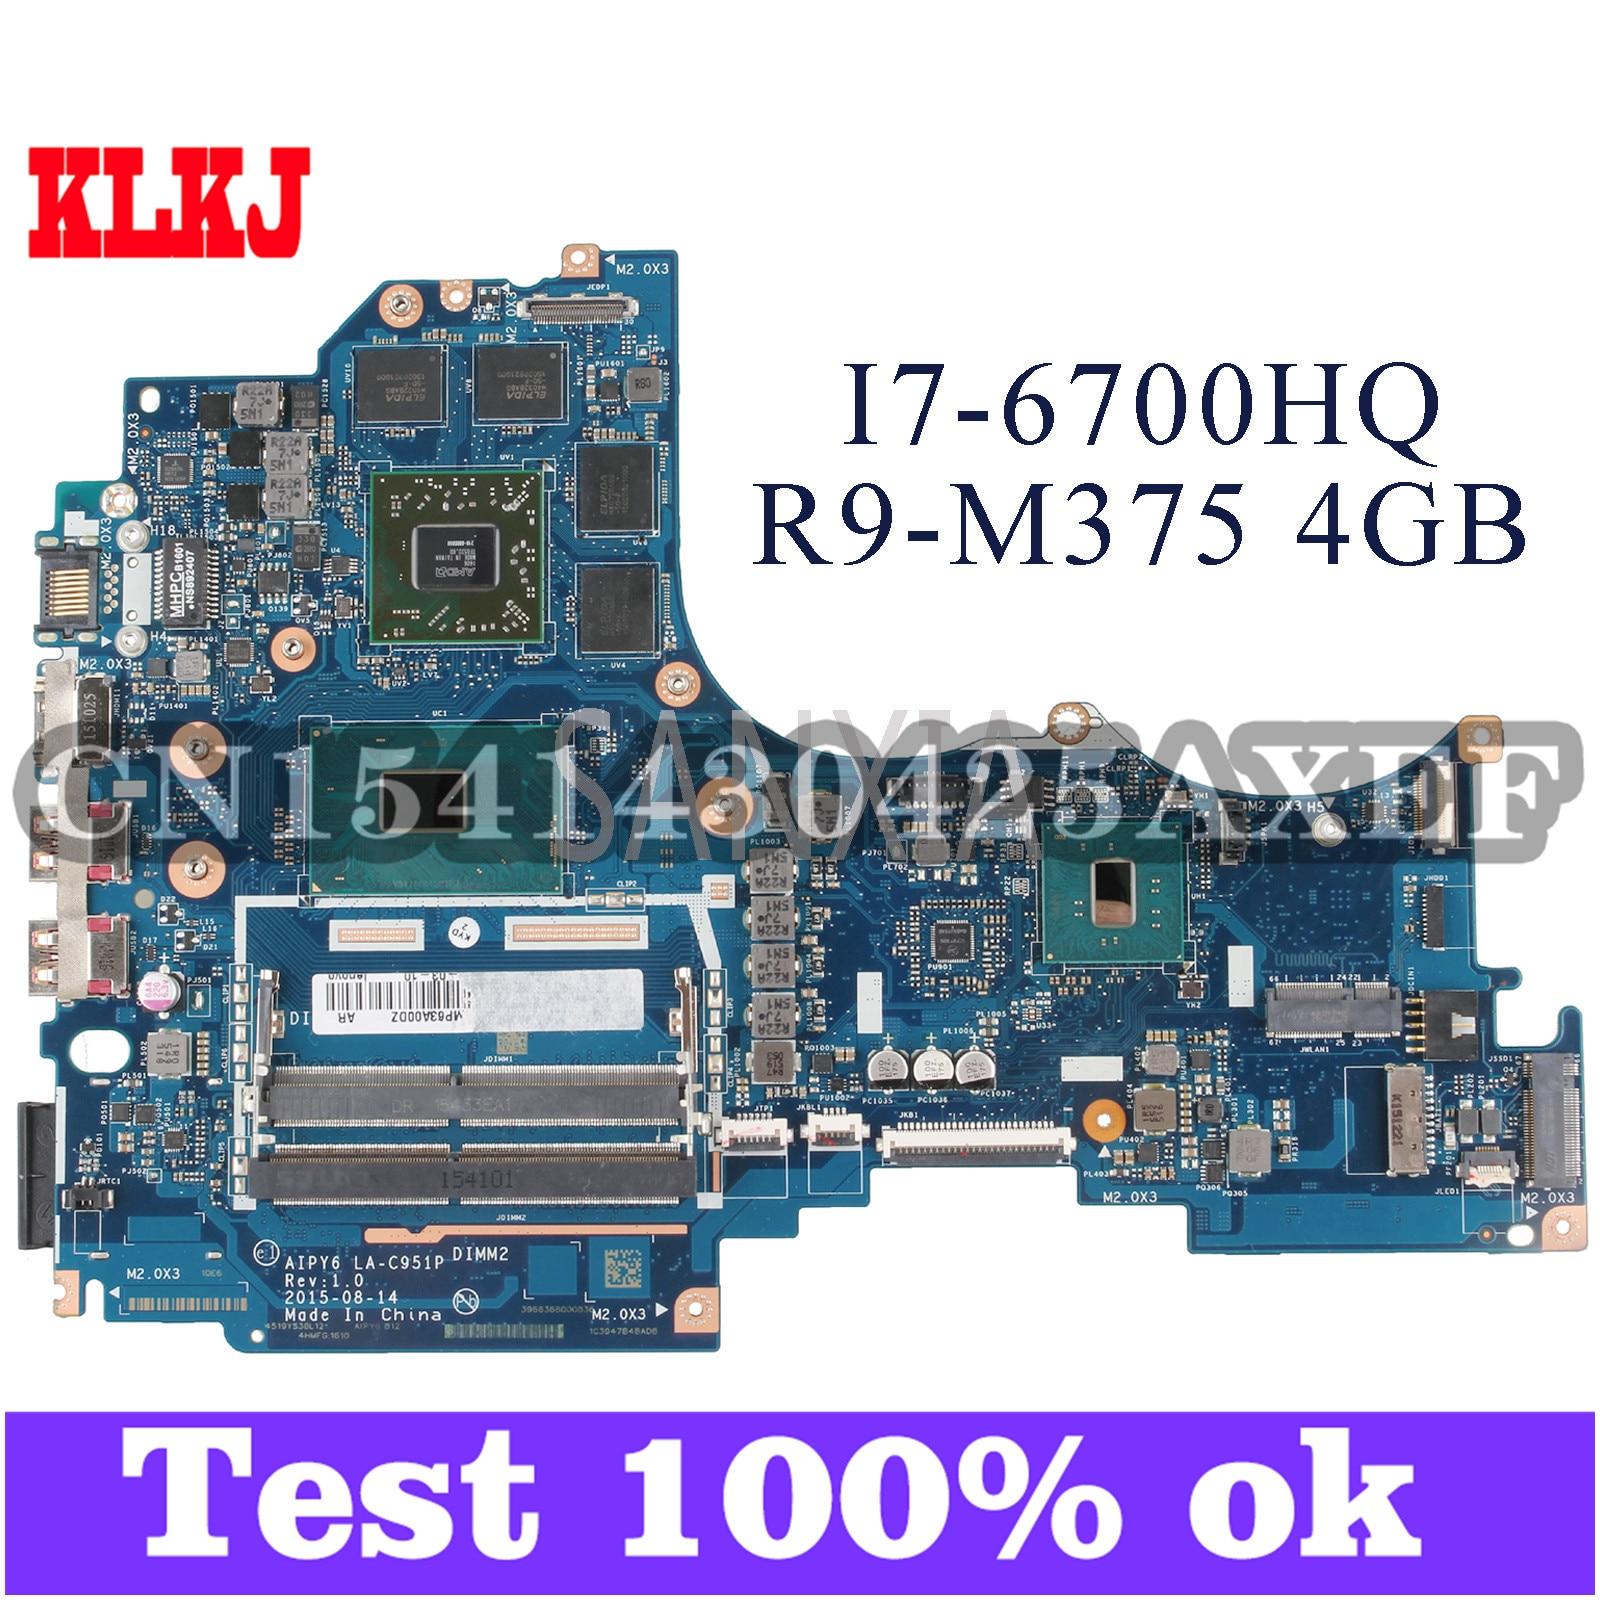 KLKJ AIPY6 LA-C951P اللوحة الأم لأجهزة الكمبيوتر المحمول لينوفو Y700-14ISK اللوحة الرئيسية الأصلية I7-6700HQ R9-M375 4GB